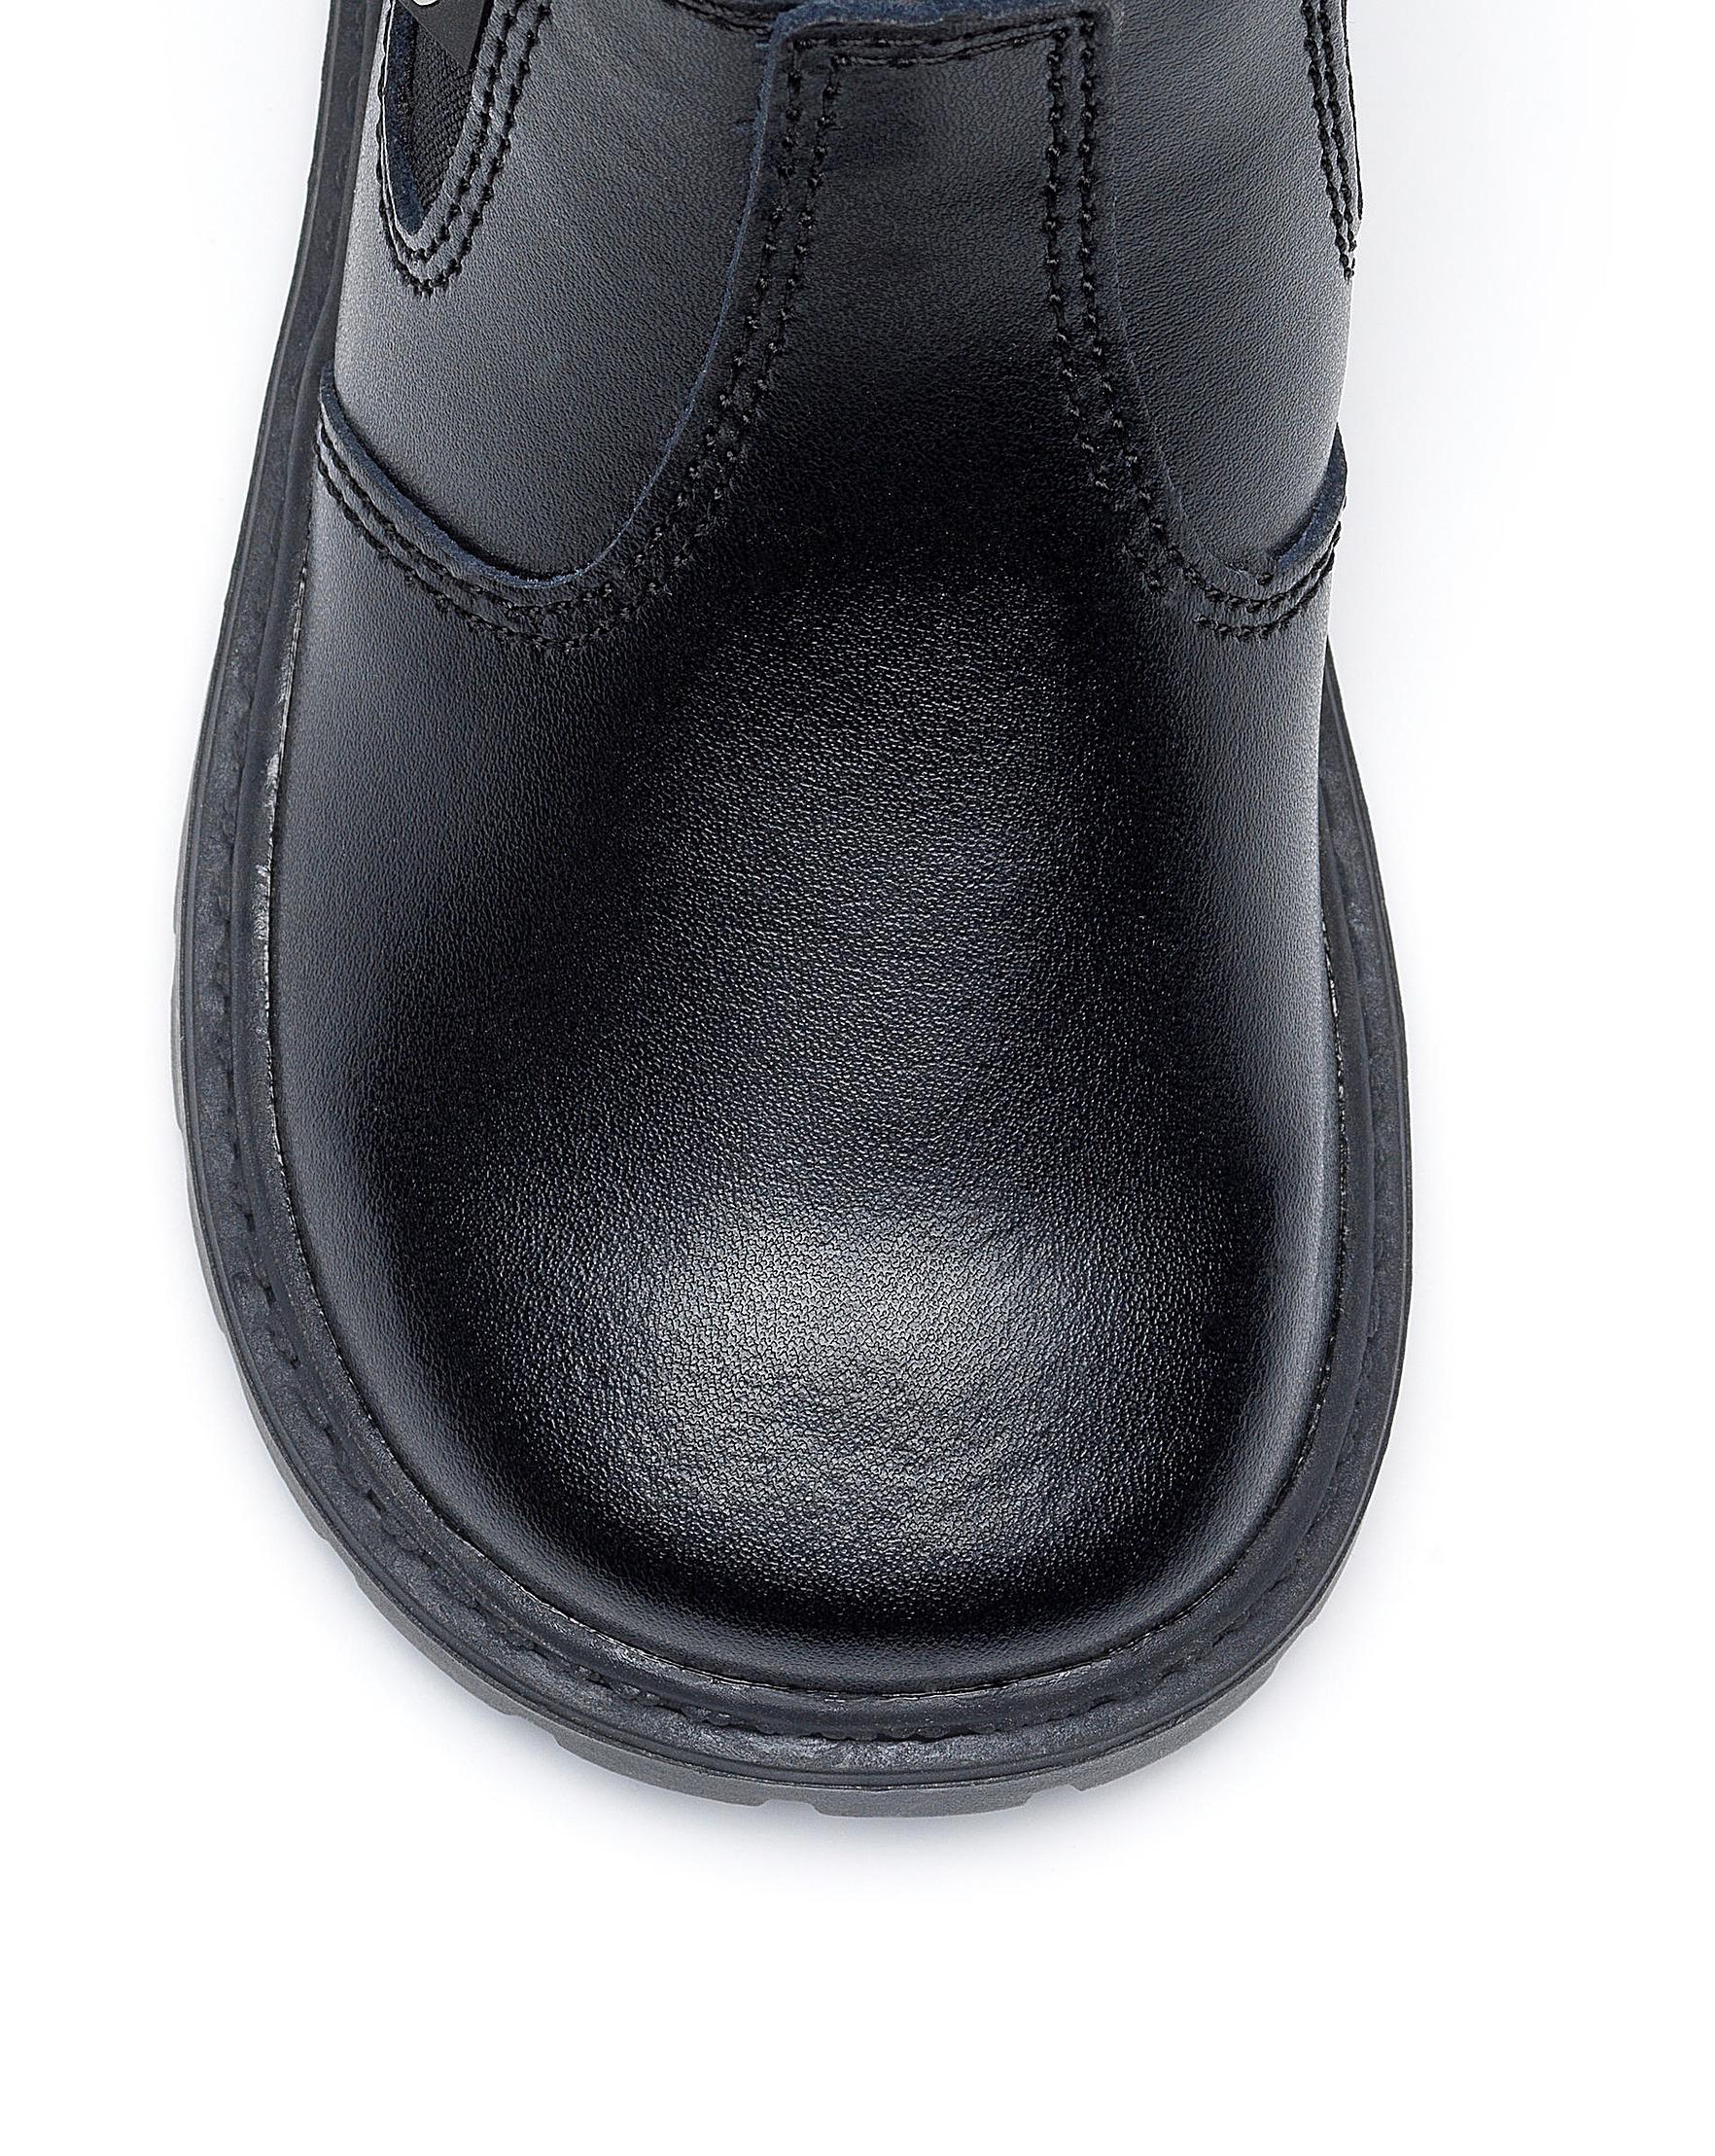 a15a7153 Chipmunks Ranch Boots   Premier Man